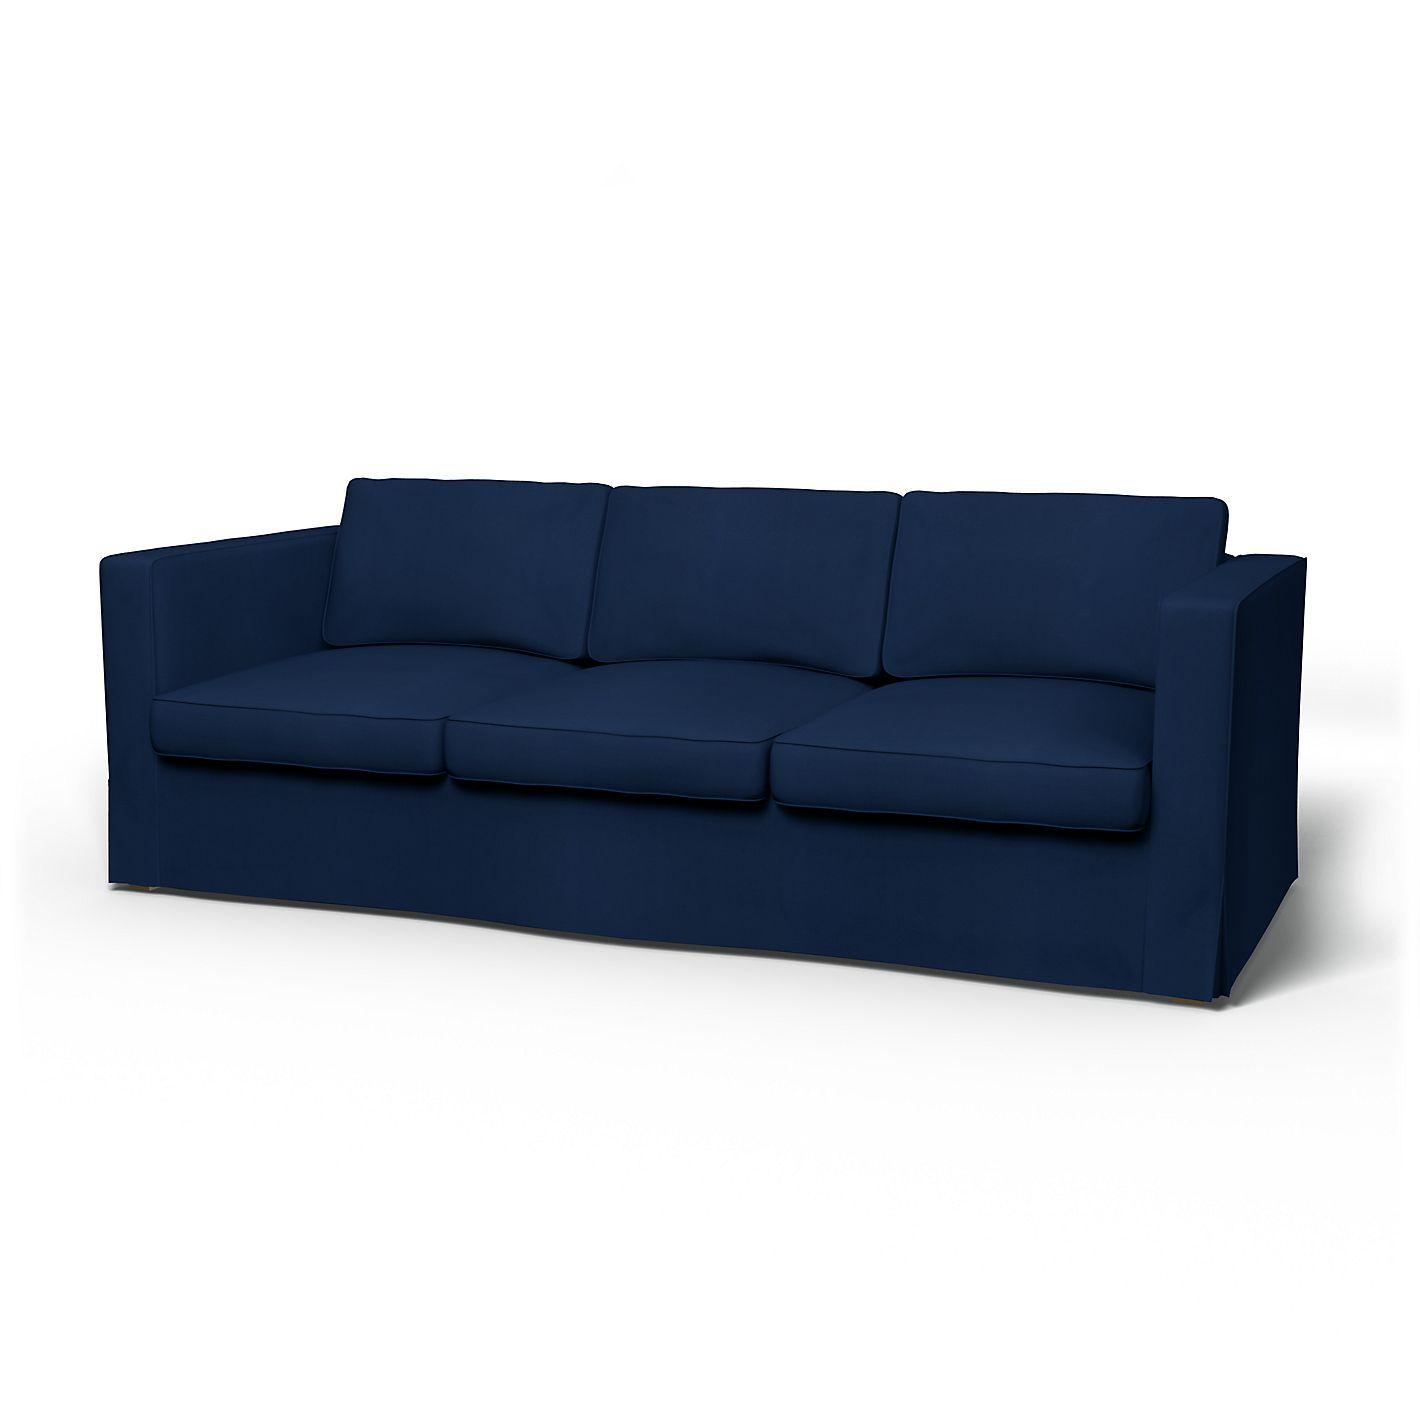 Karlanda 3 Seater Sofa Bed – Hereo Sofa